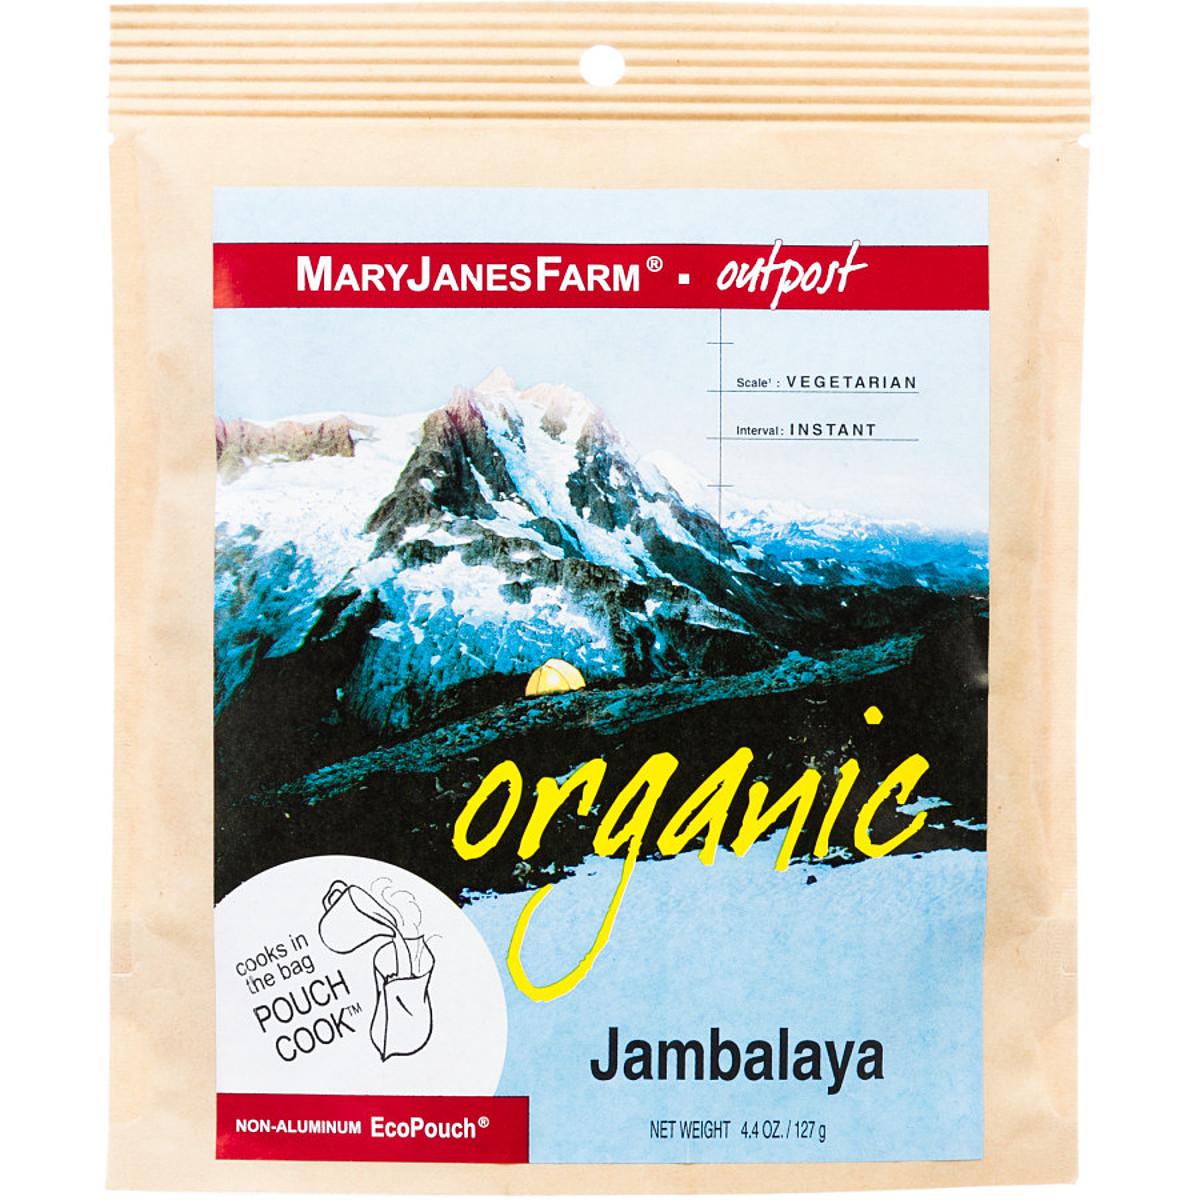 Mary Janes Farm Organic Jambalaya